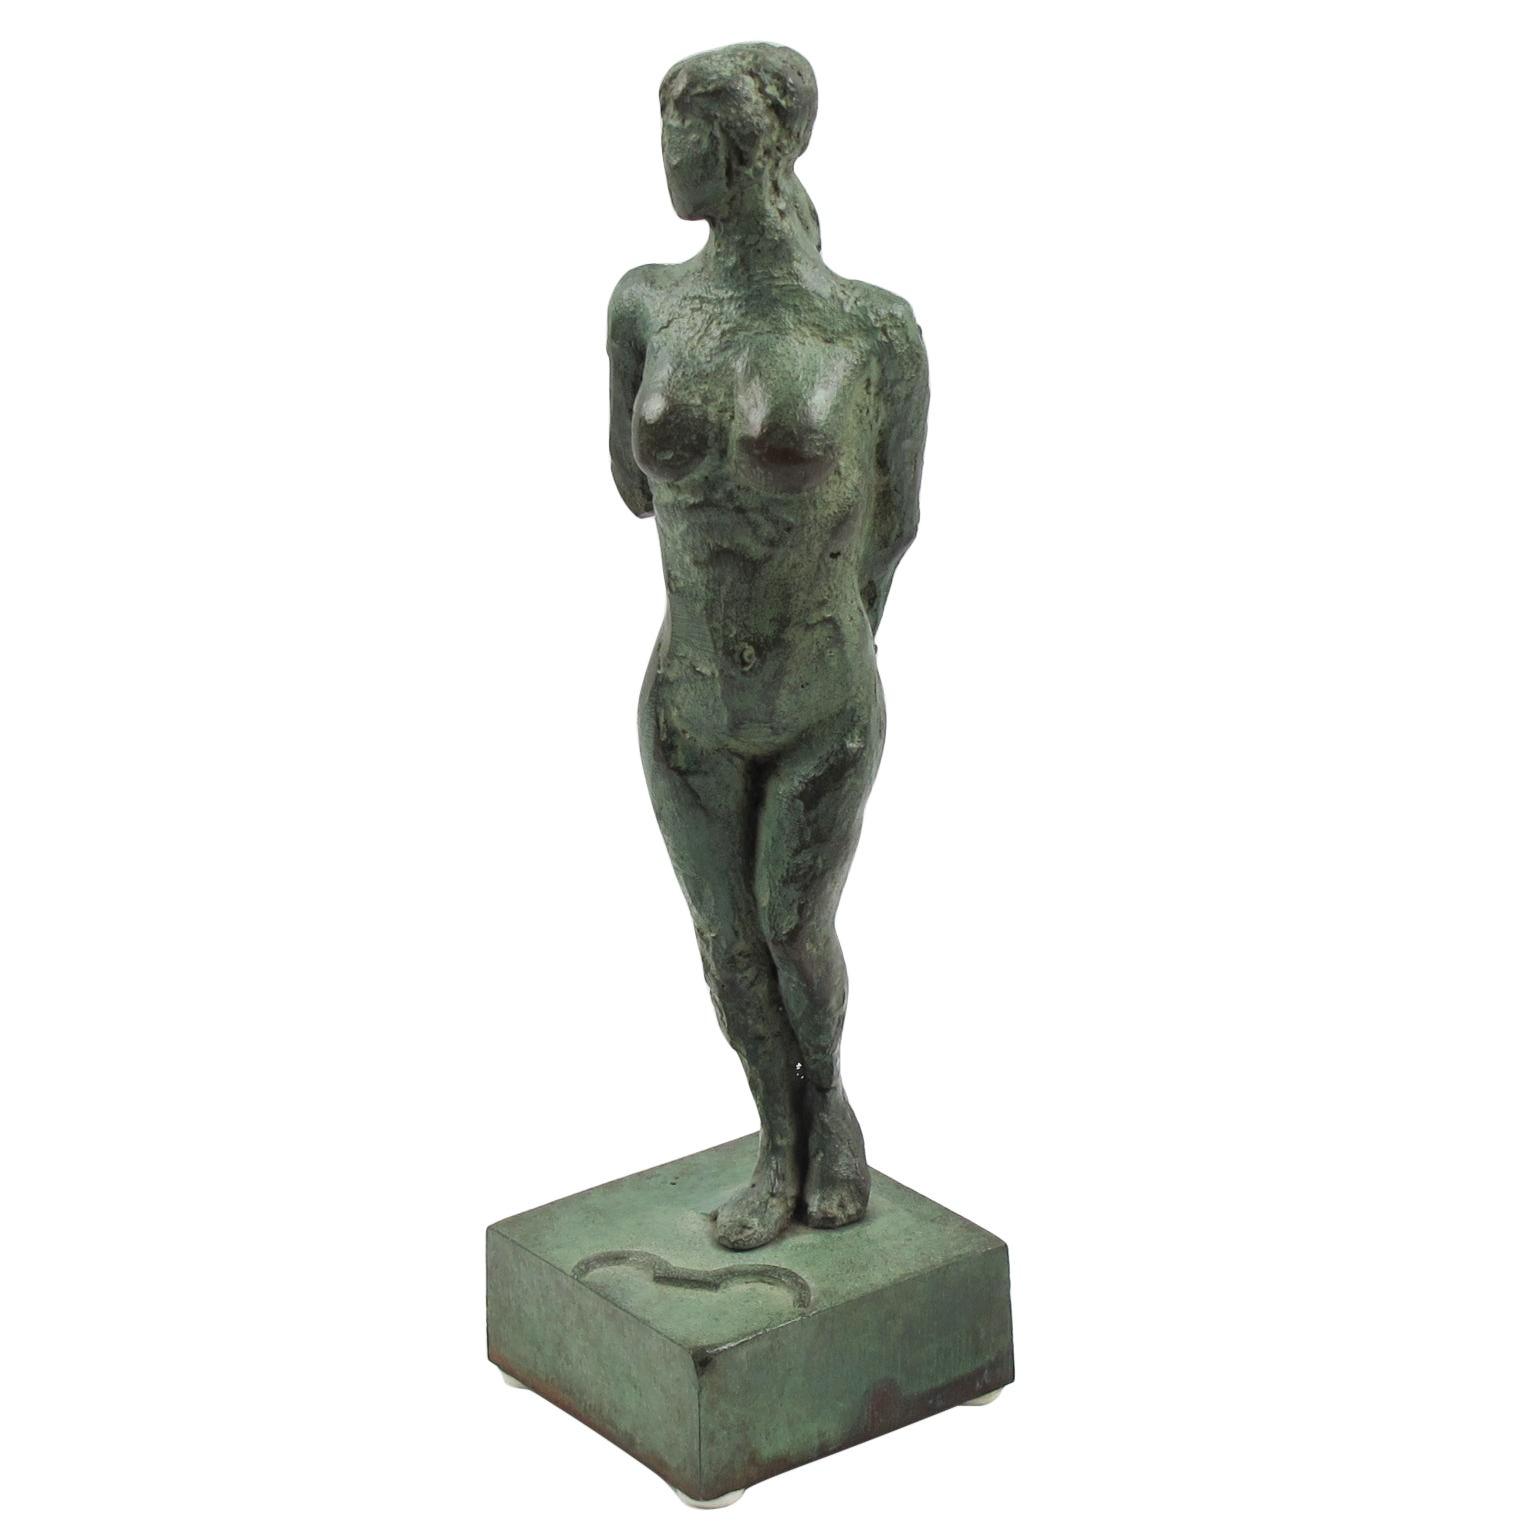 French Art Deco Bronze Sculpture Artemis Diana the Huntress